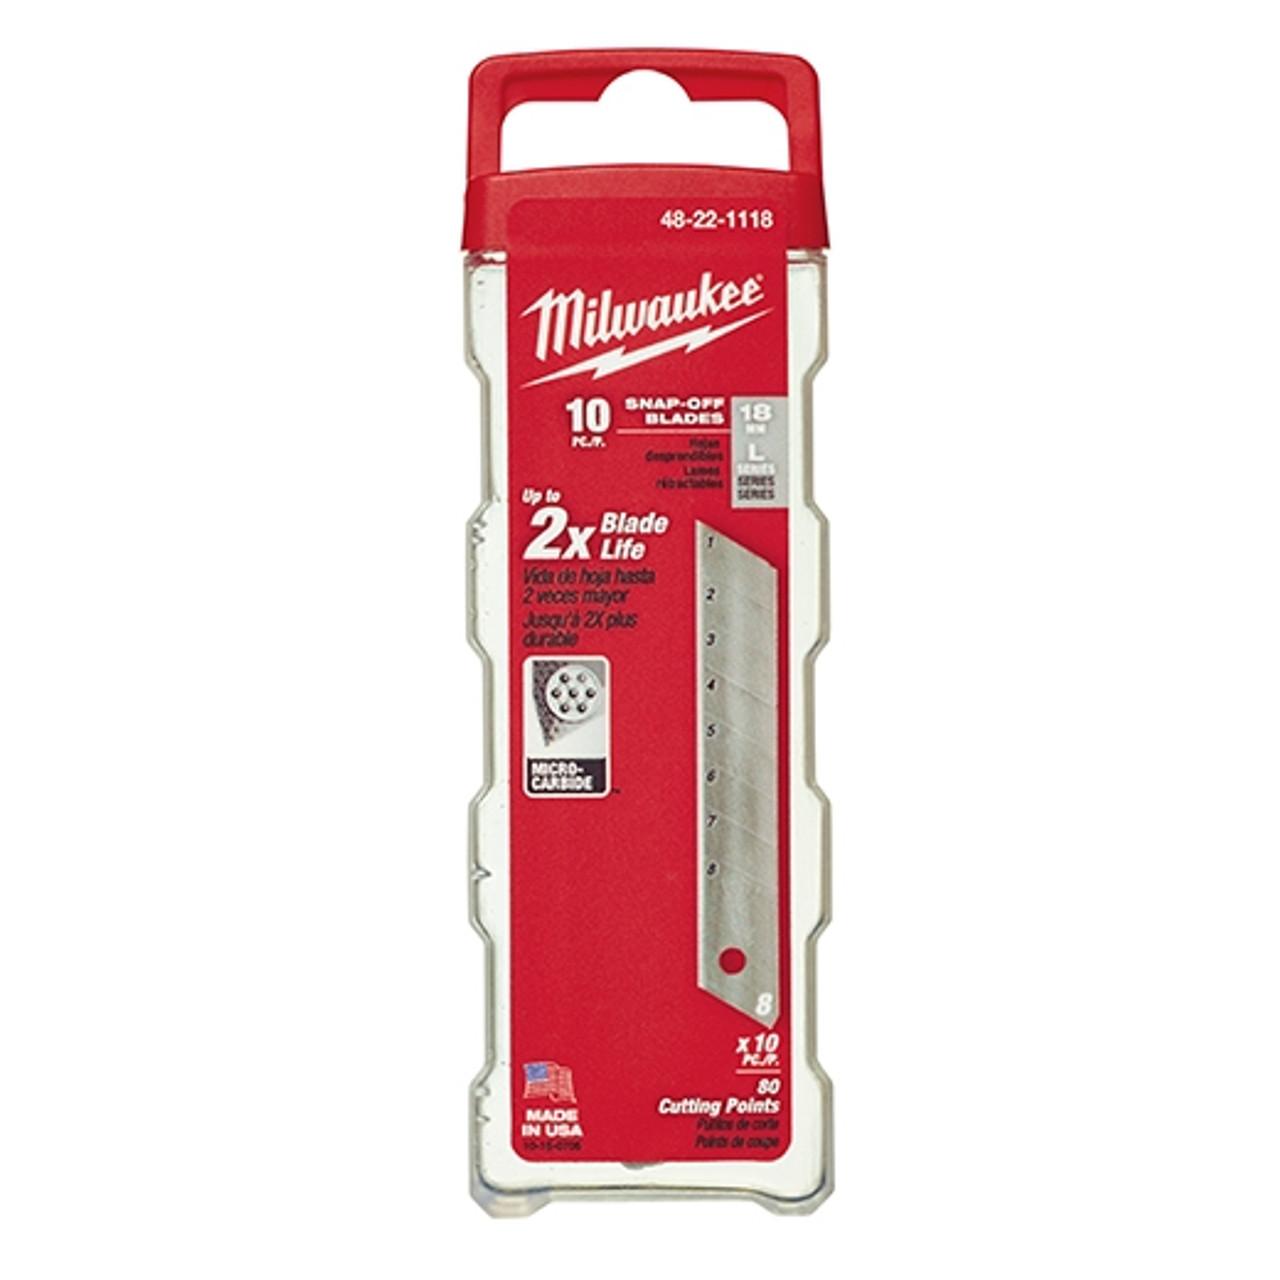 Milwaukee 48-22-1118 18mm General Purpose Snap Blades (10 PK)